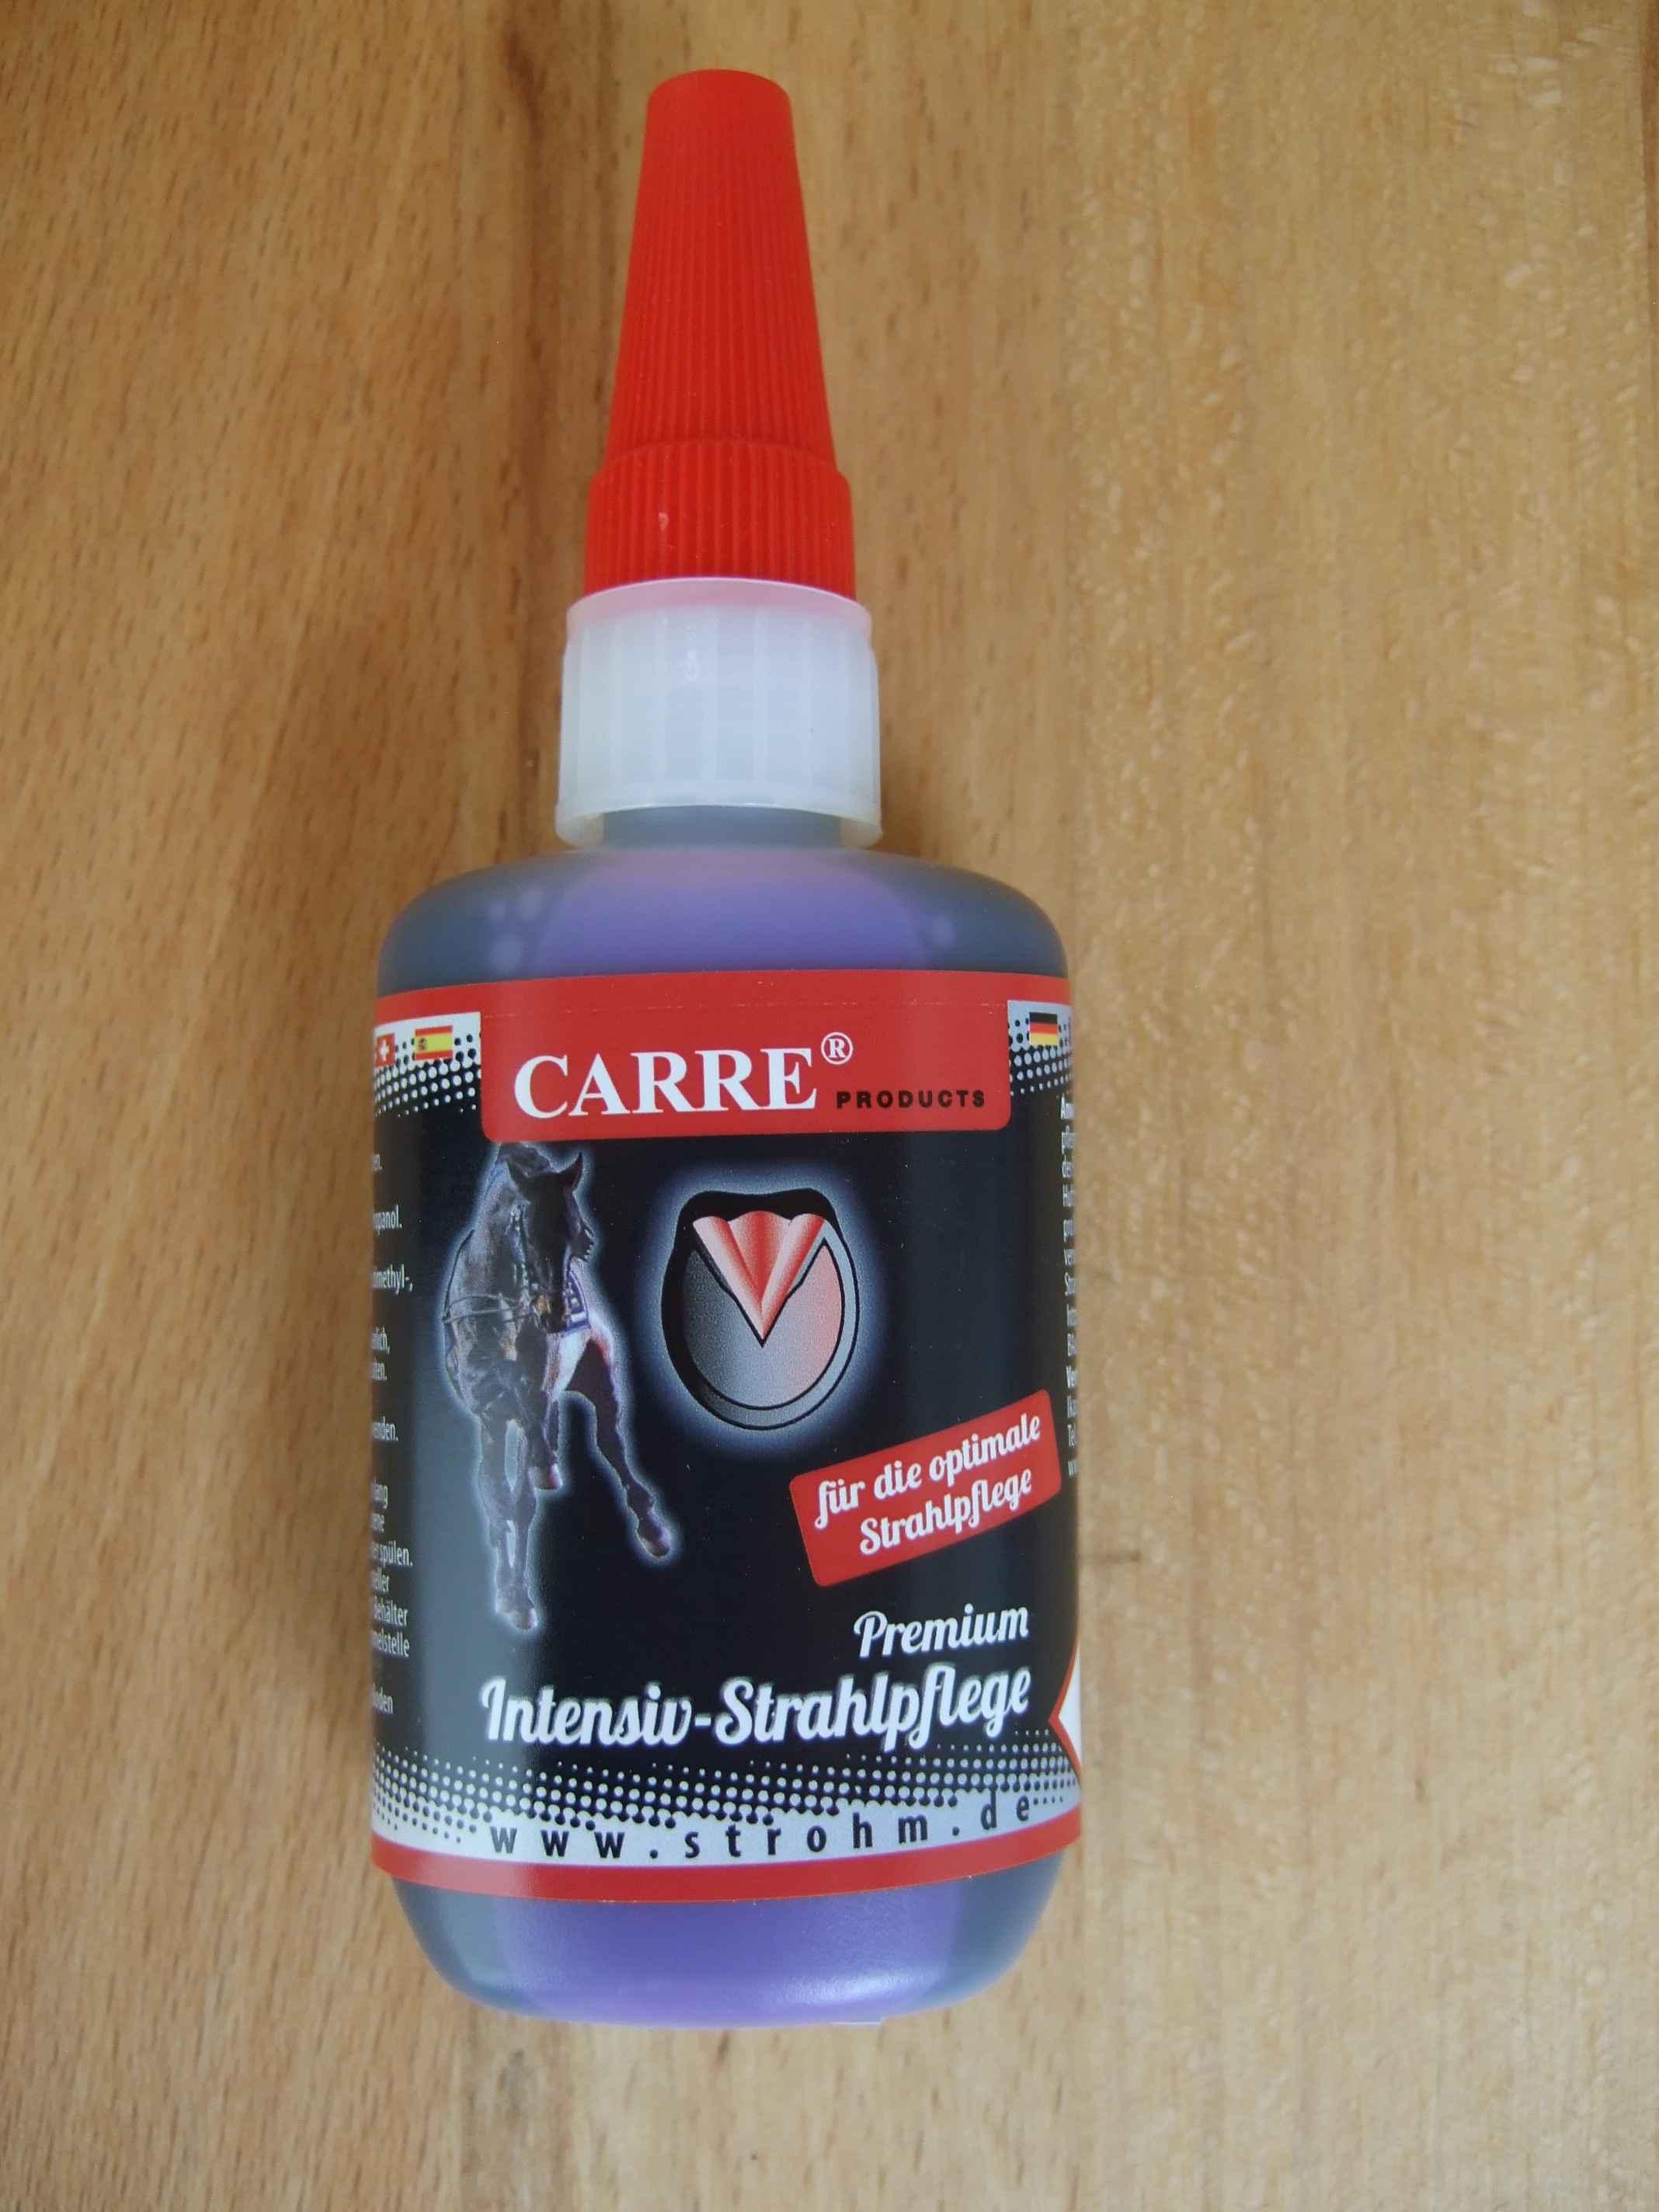 CARRÉ Intensiv-Strahlpflege